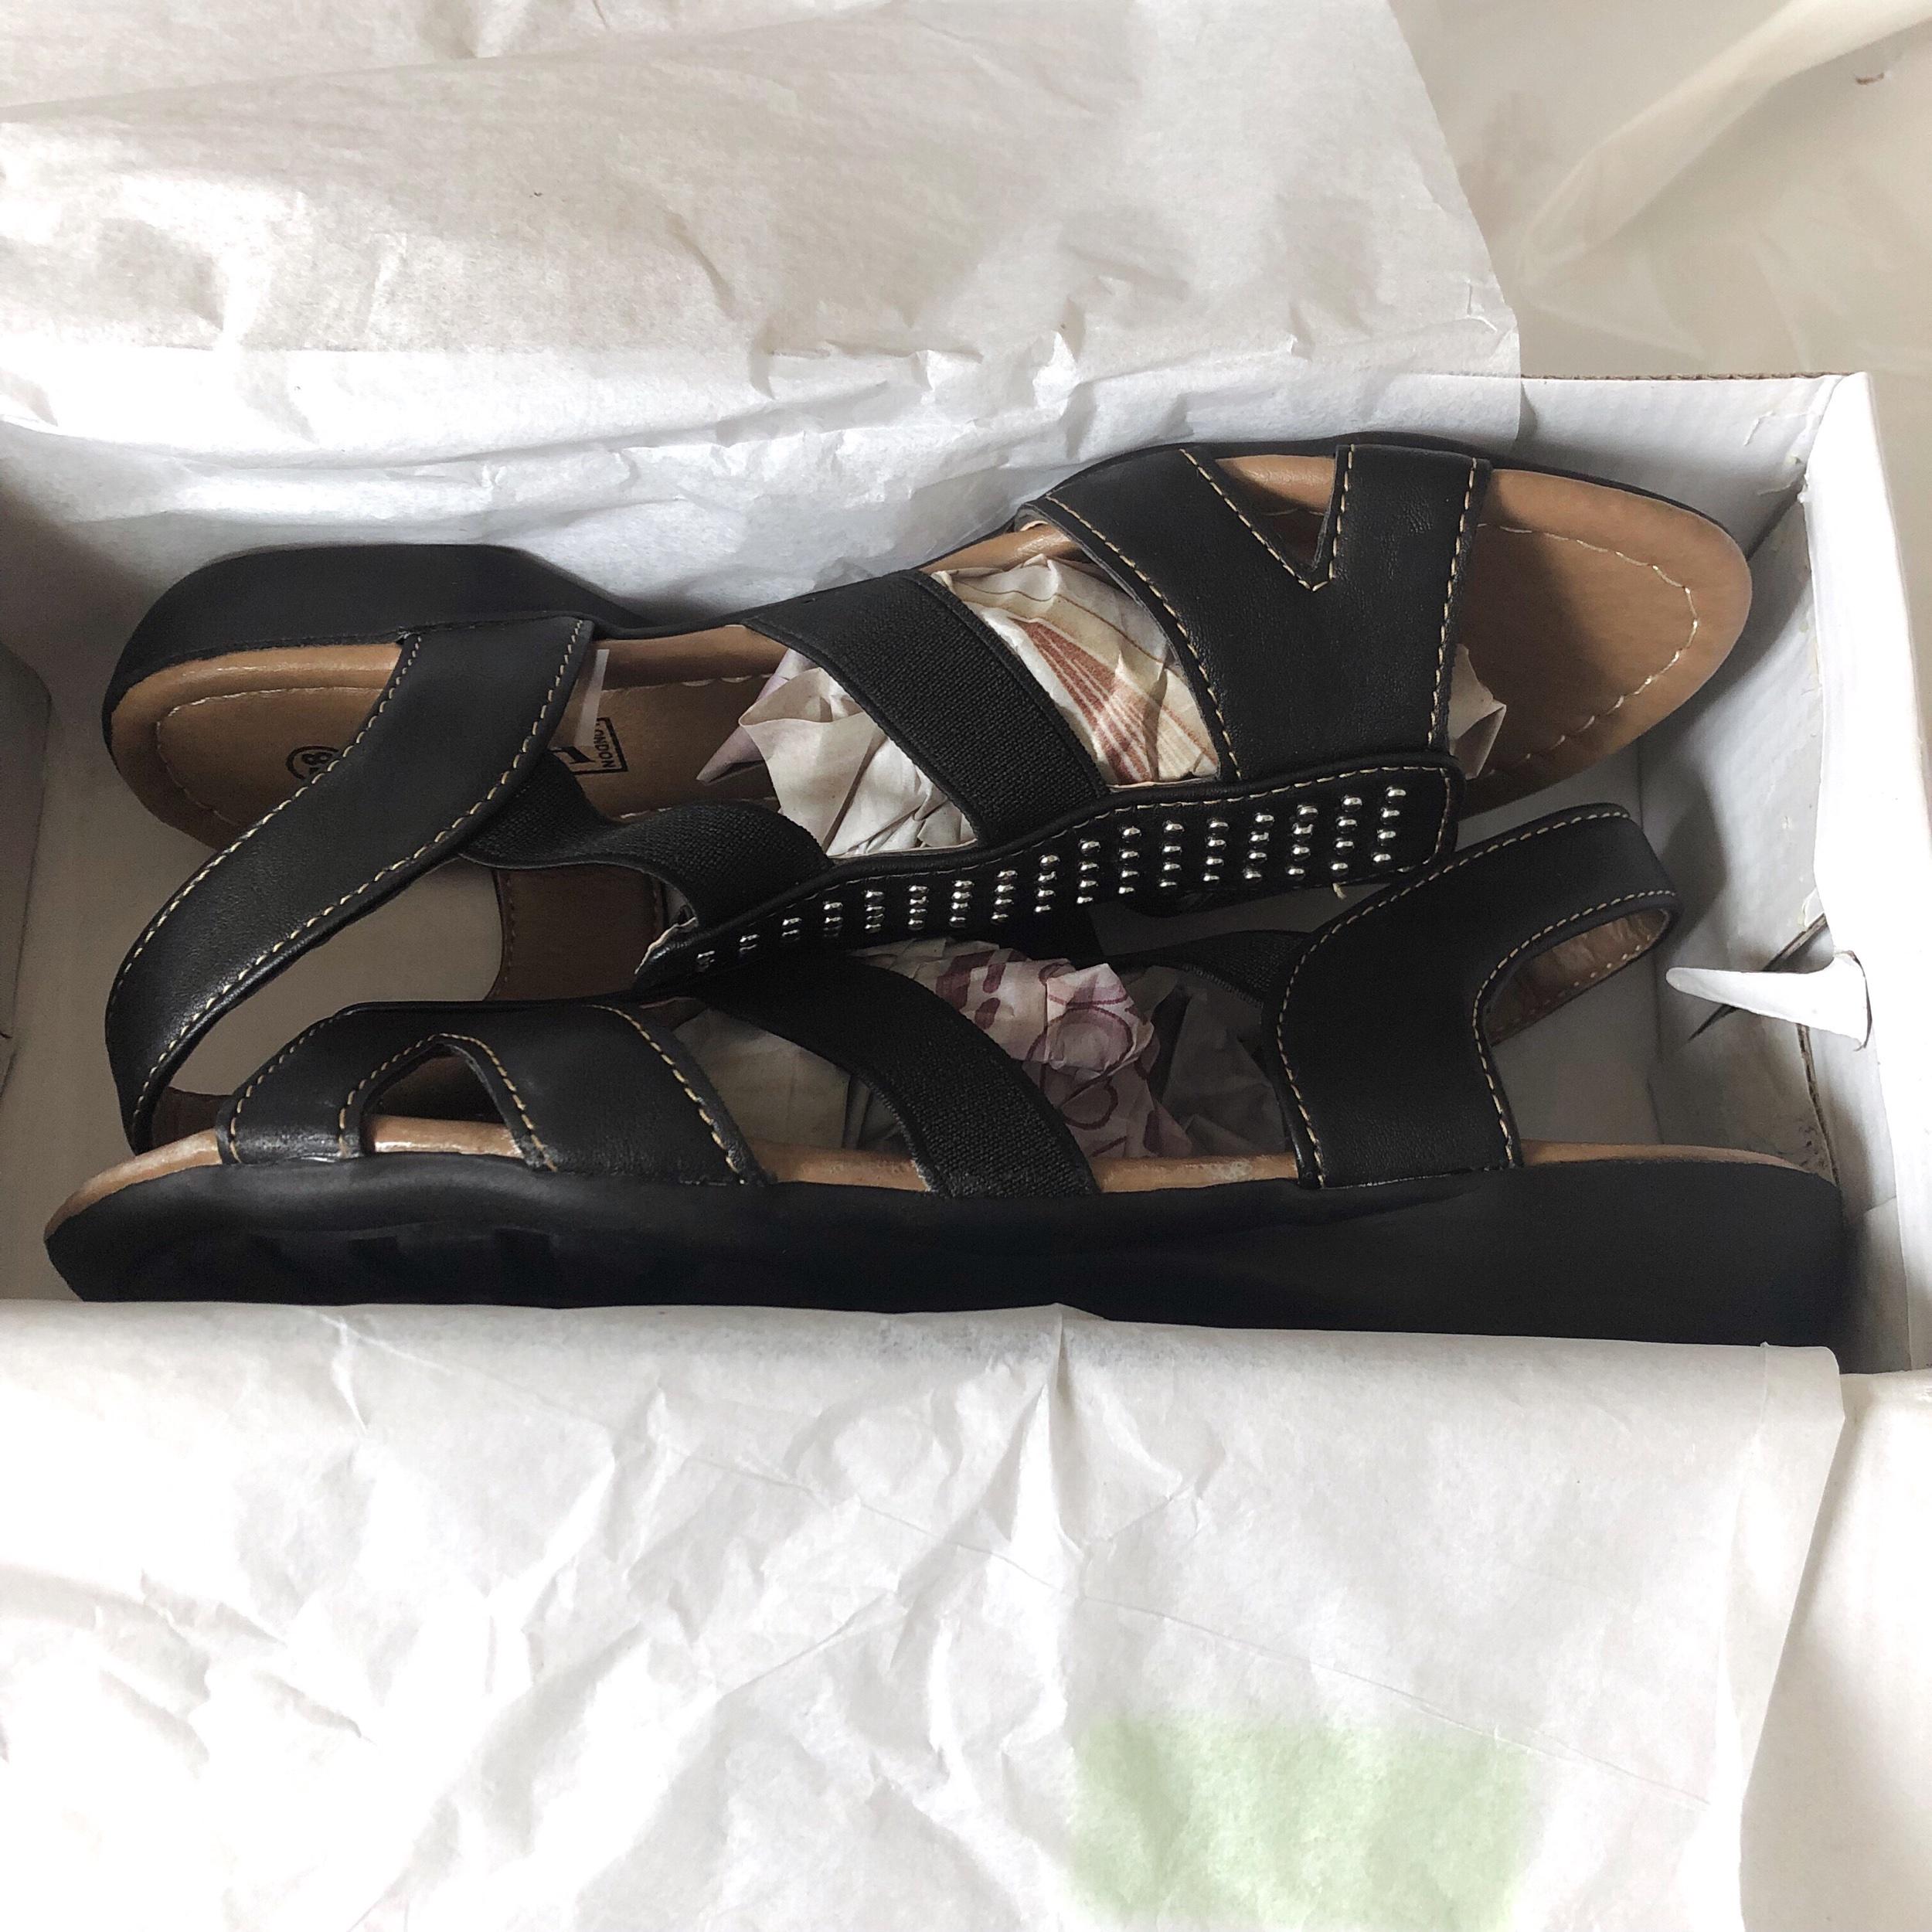 Svarta sandaler med silverdetaljer.